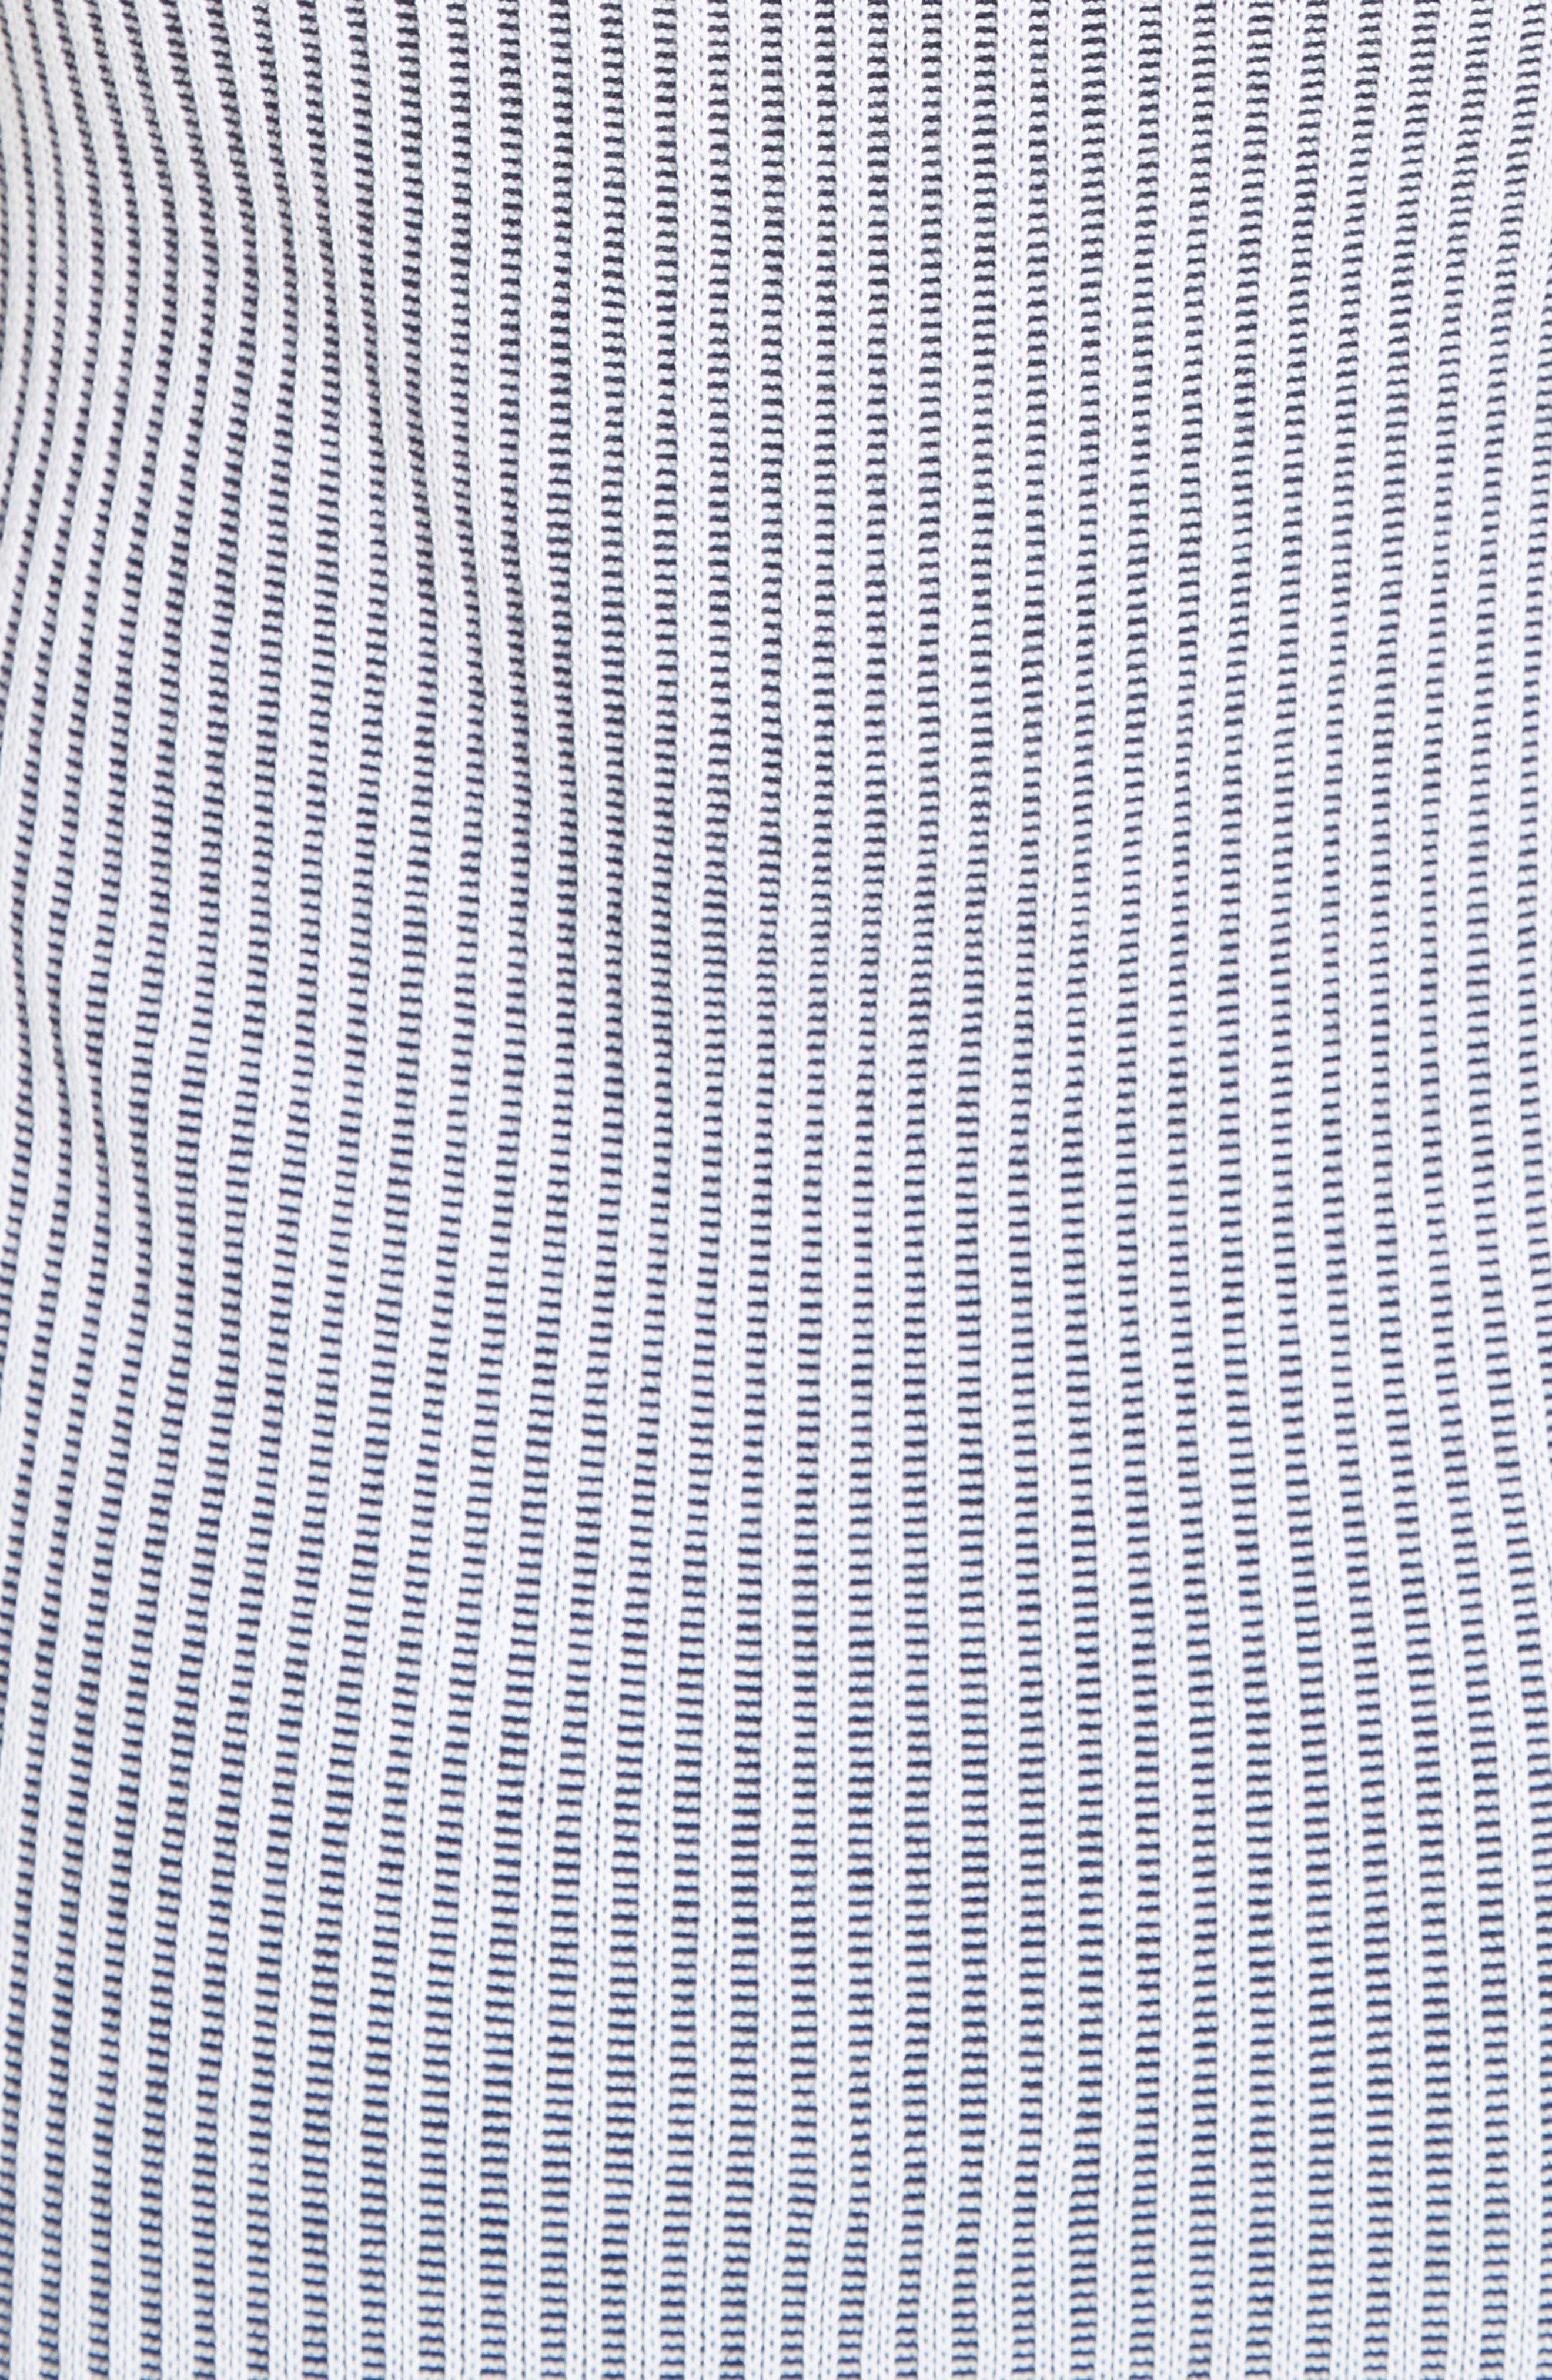 Alternate Image 3  - St. John Collection Two-Tone Rib Knit Dress